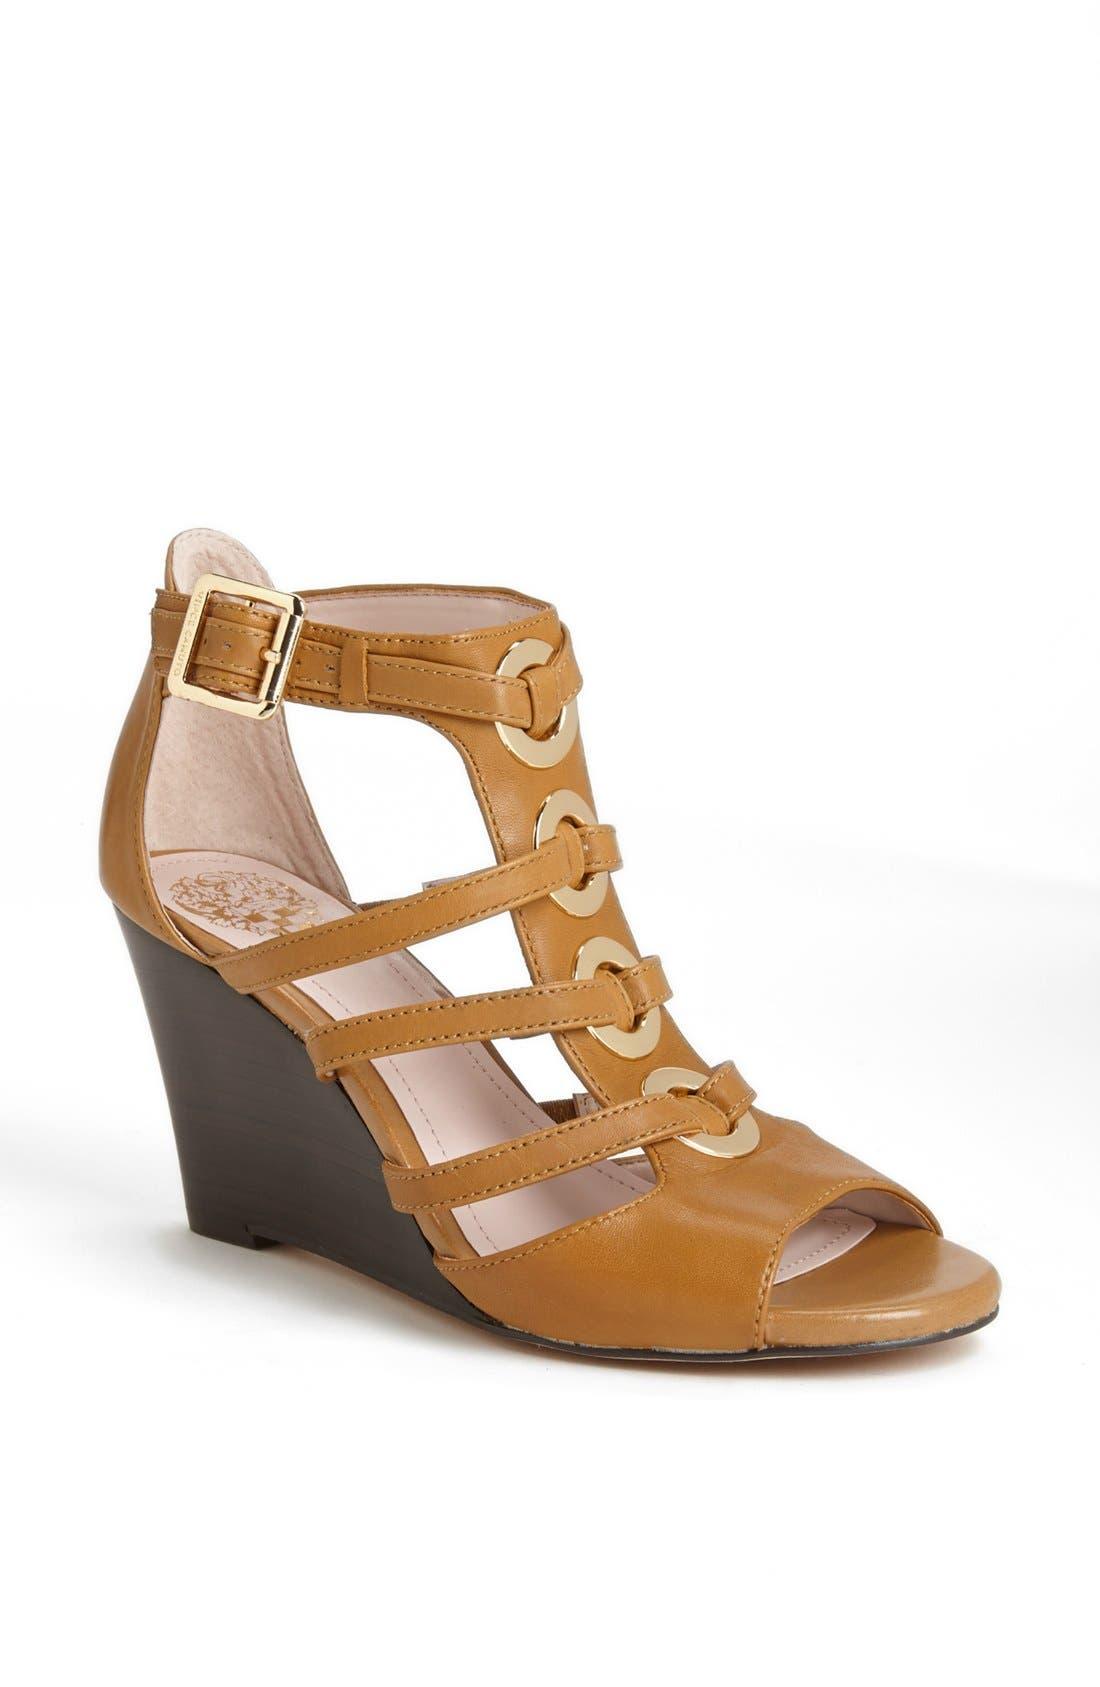 Main Image - Vince Camuto 'Huni' Sandal